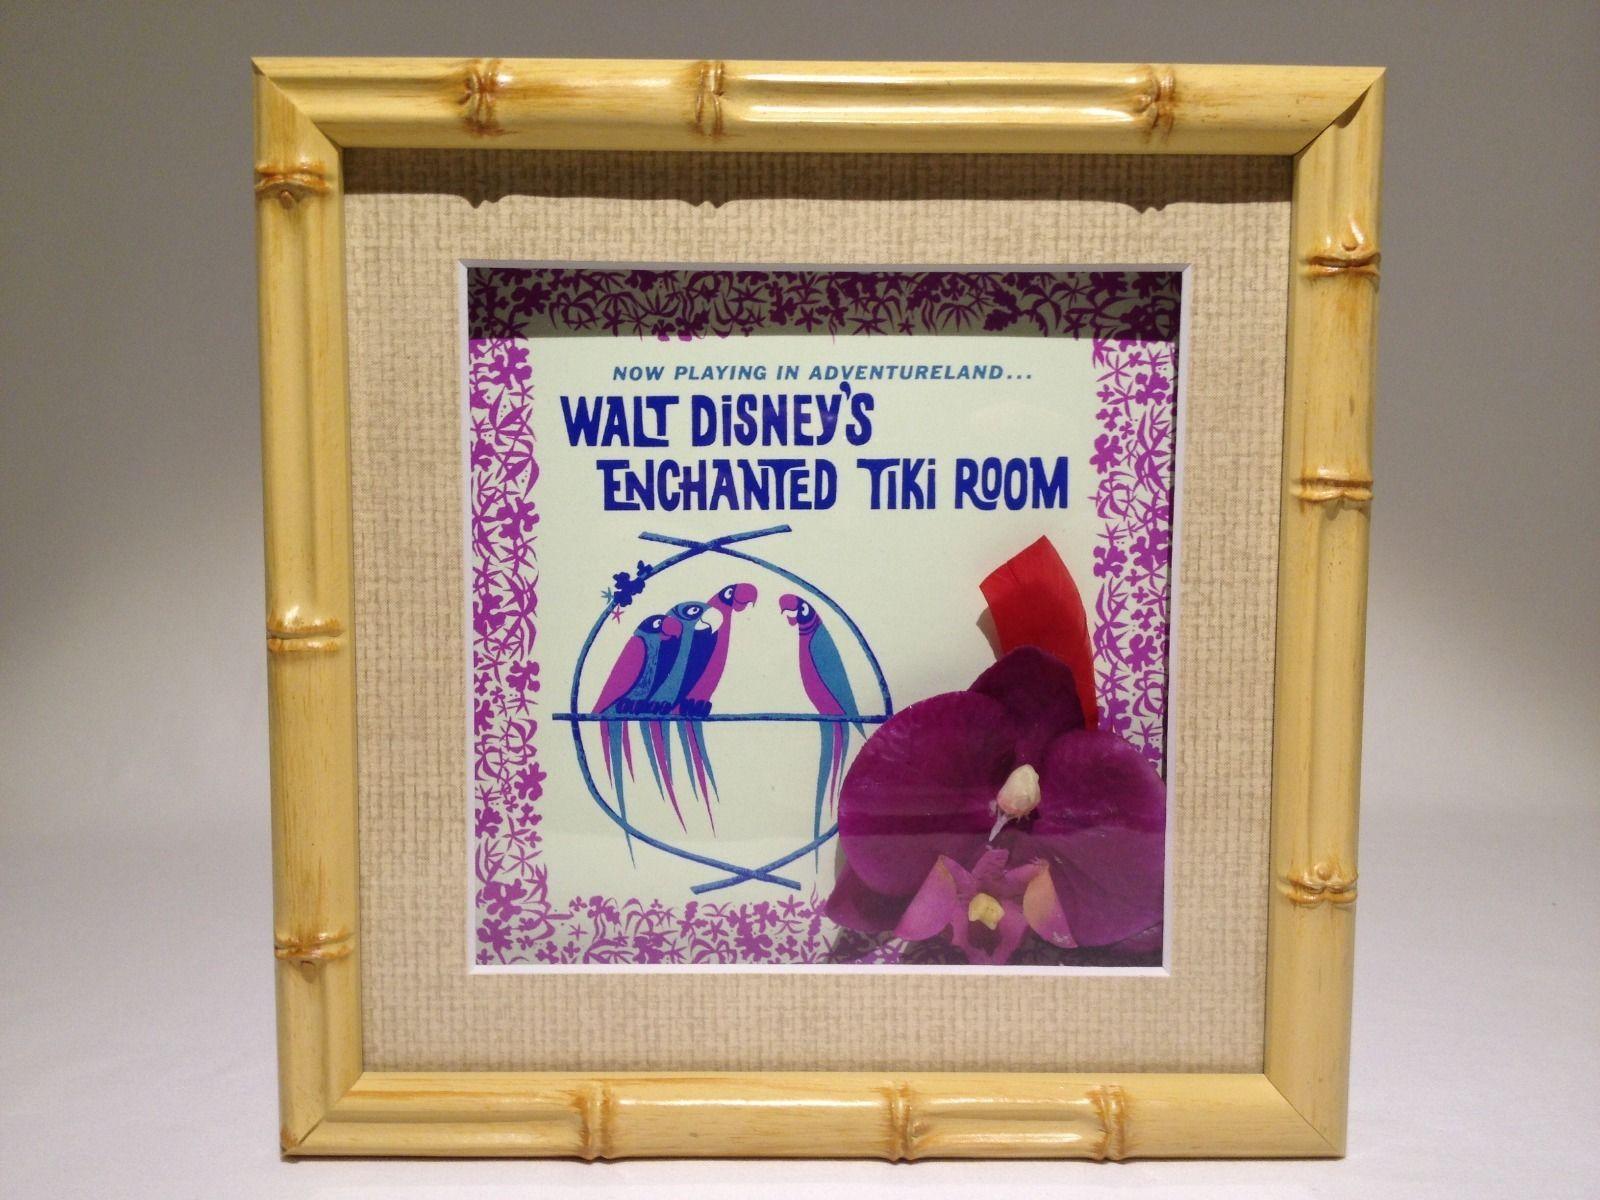 Disneyland Club 33 Enchanted Tiki Room 50th Anniversary Flower and ...